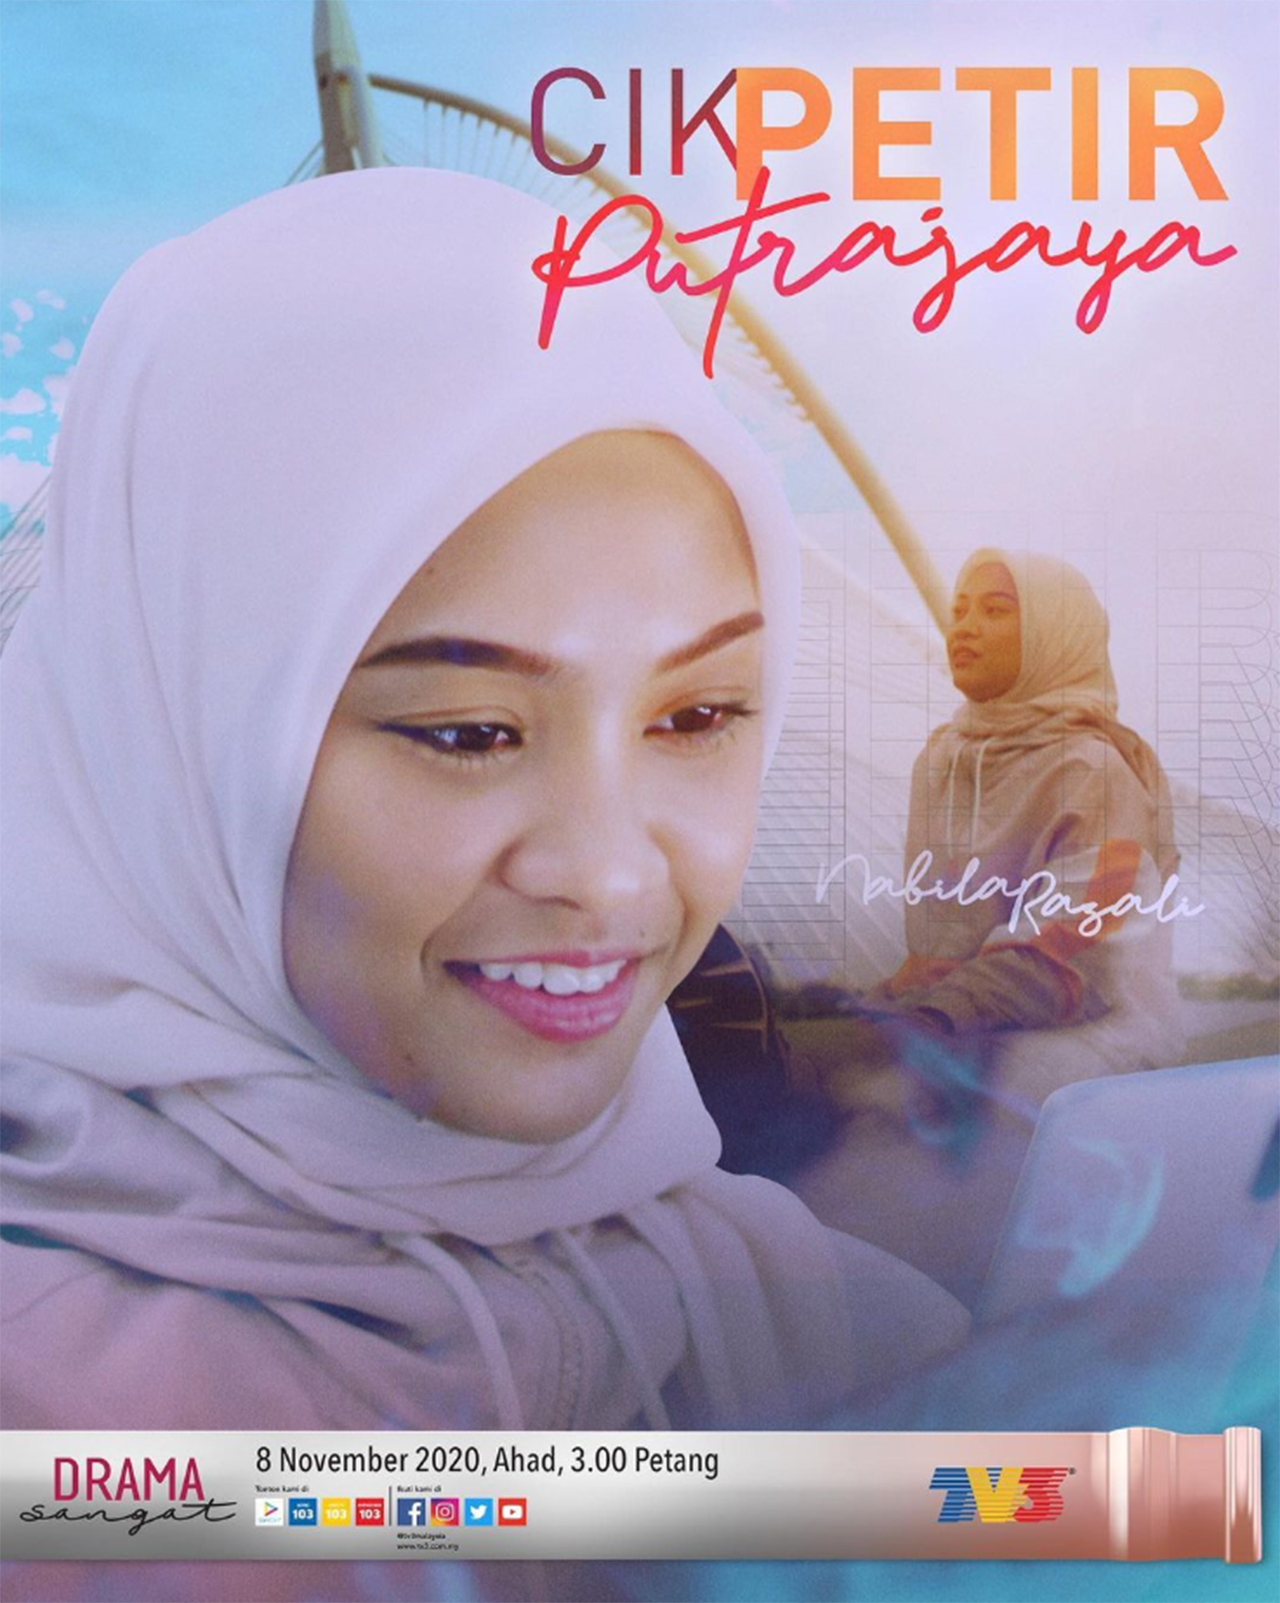 Telefilem Cik Petir Putrajaya Lakonan Nabila Razali dan Niezam Zaidi